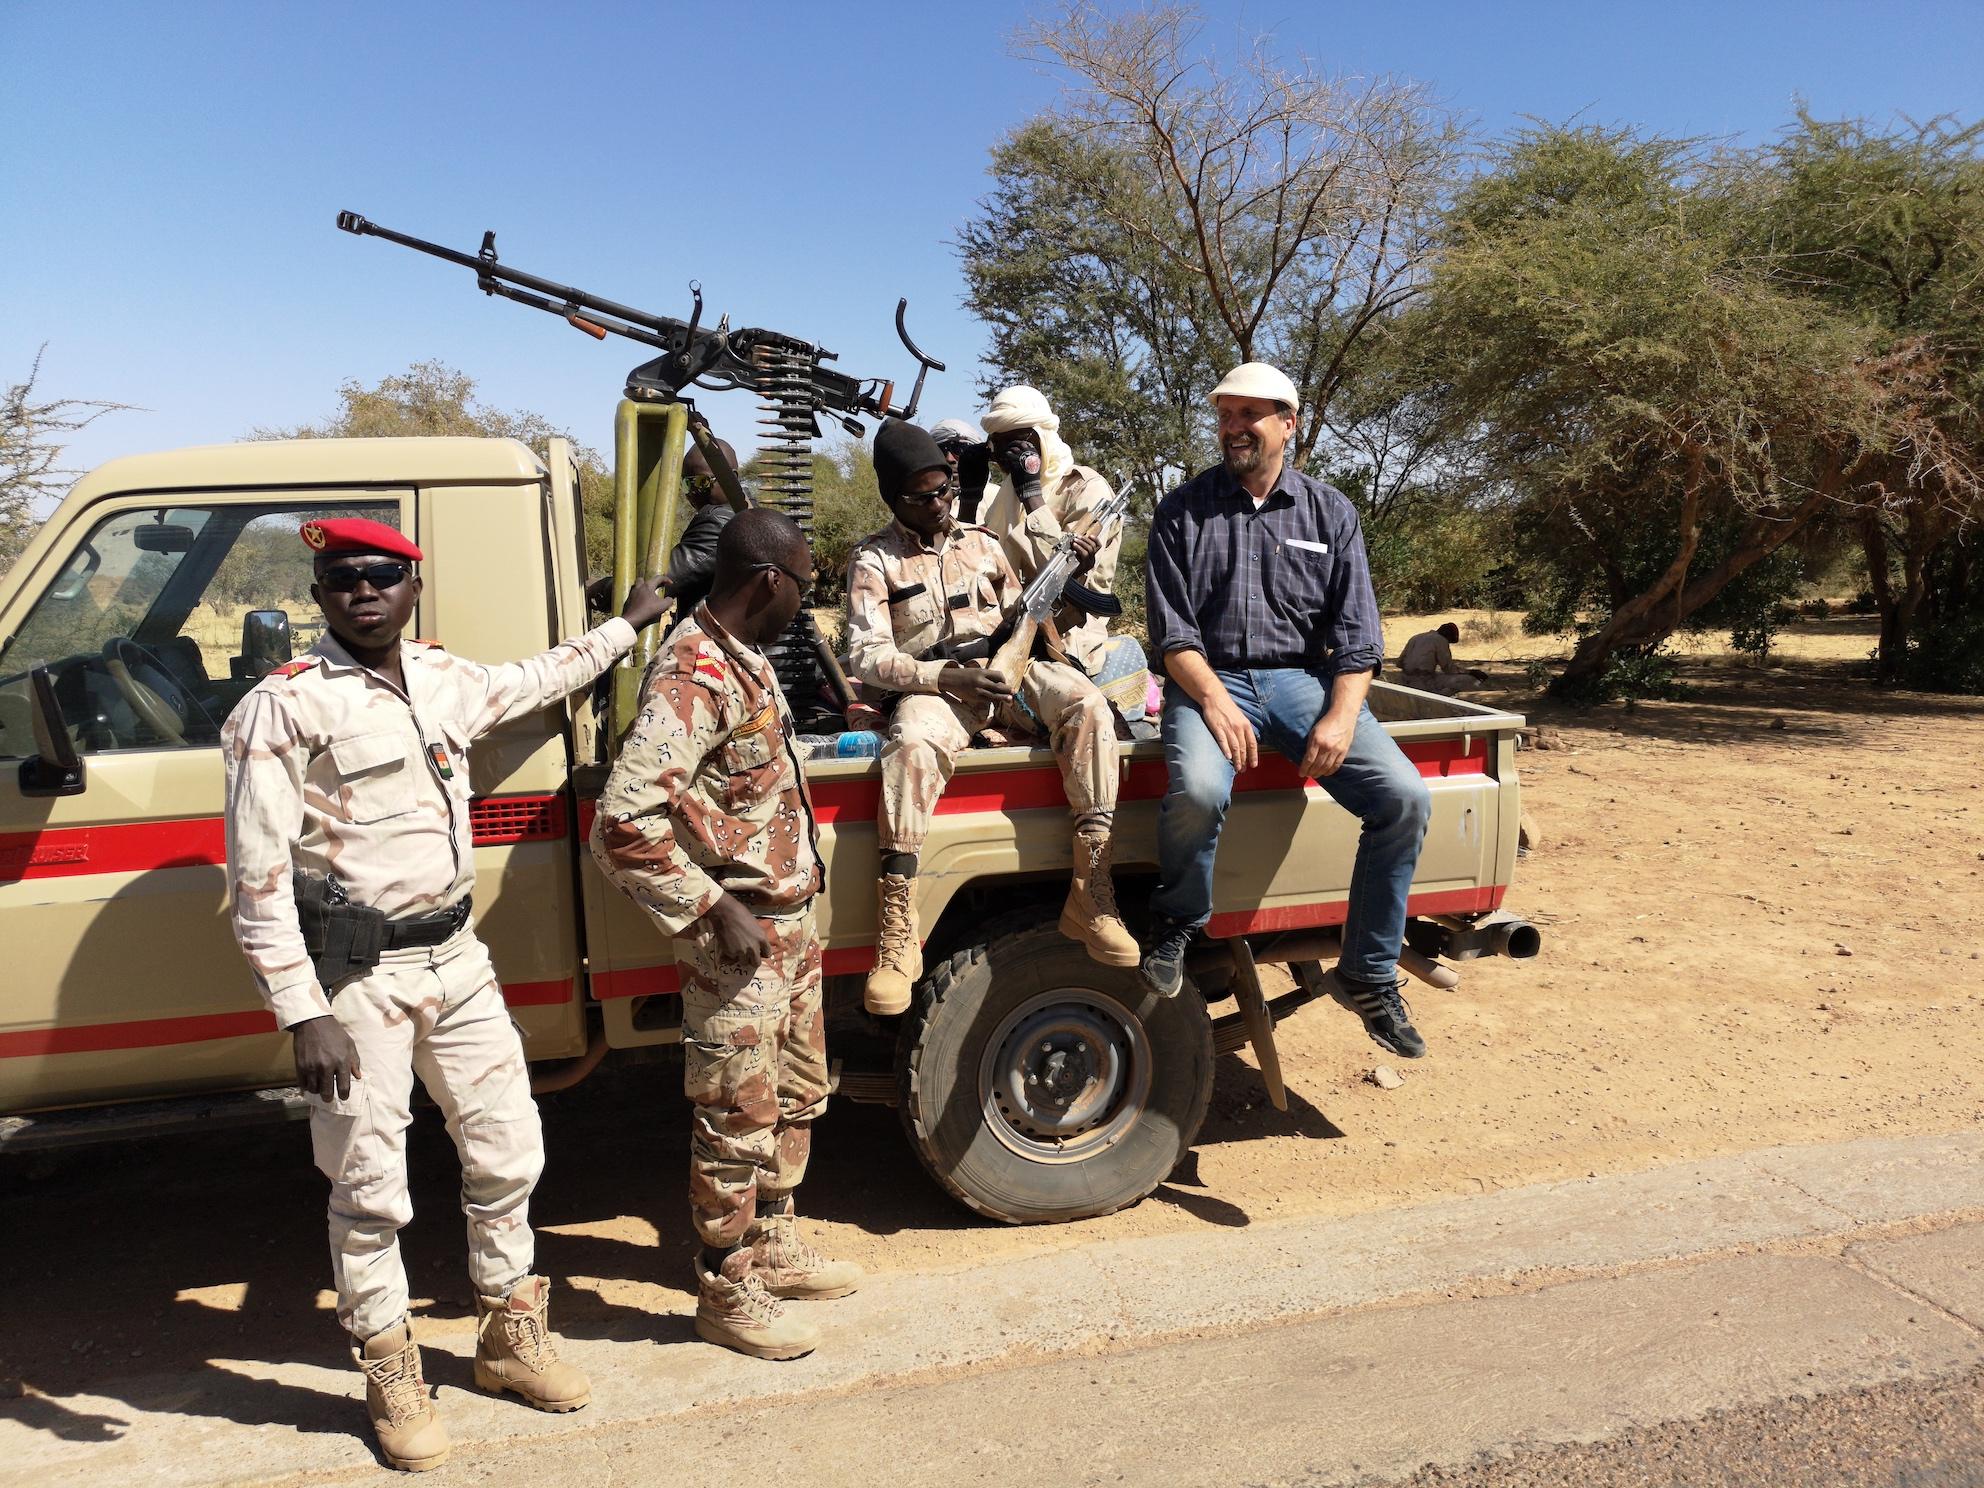 En route avec la garde nationale nigérienne (c) Lutz Mükke